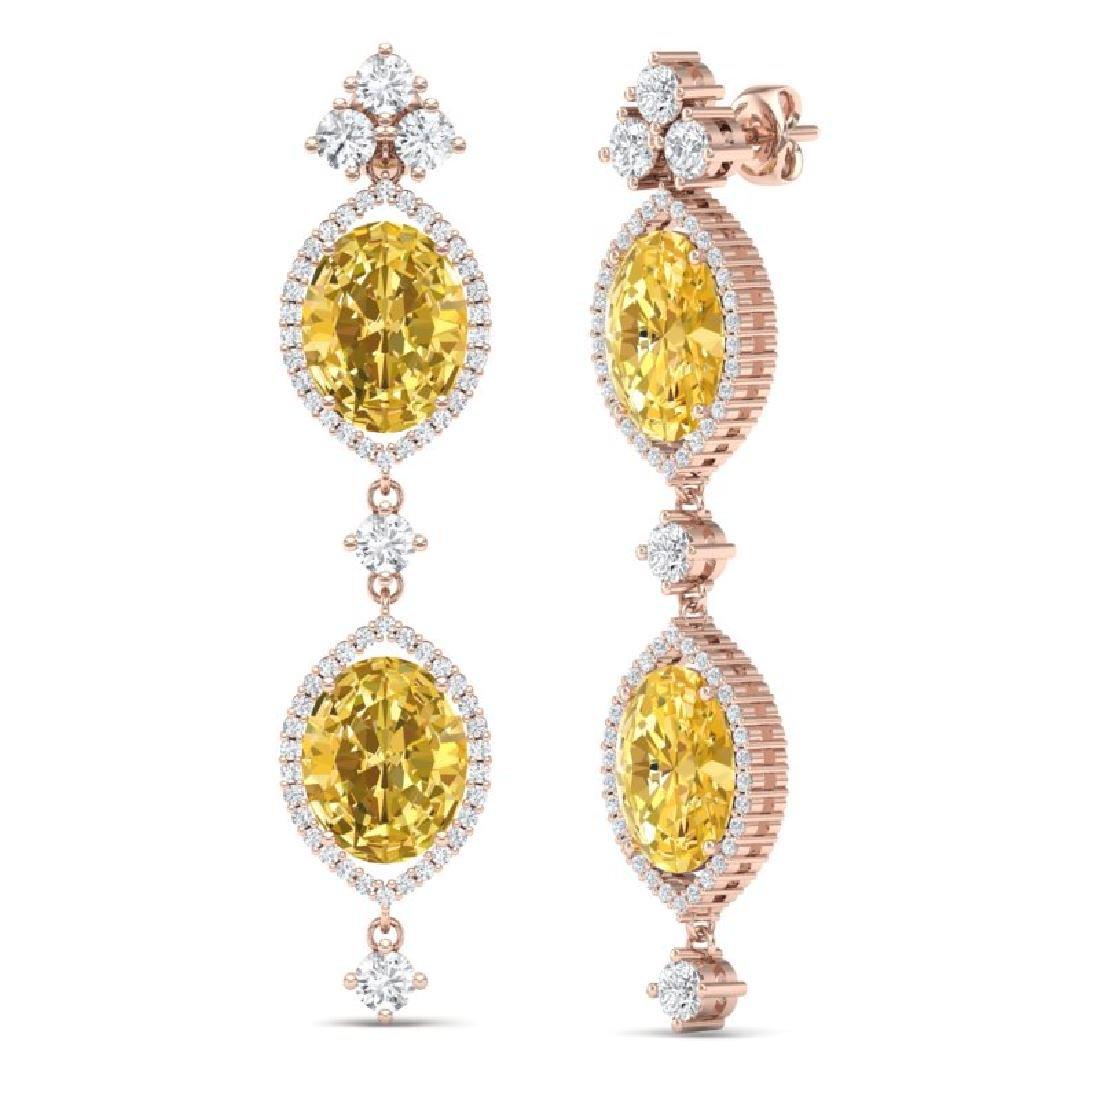 12.21 CTW Royalty Canary Citrine & VS Diamond Earrings - 3